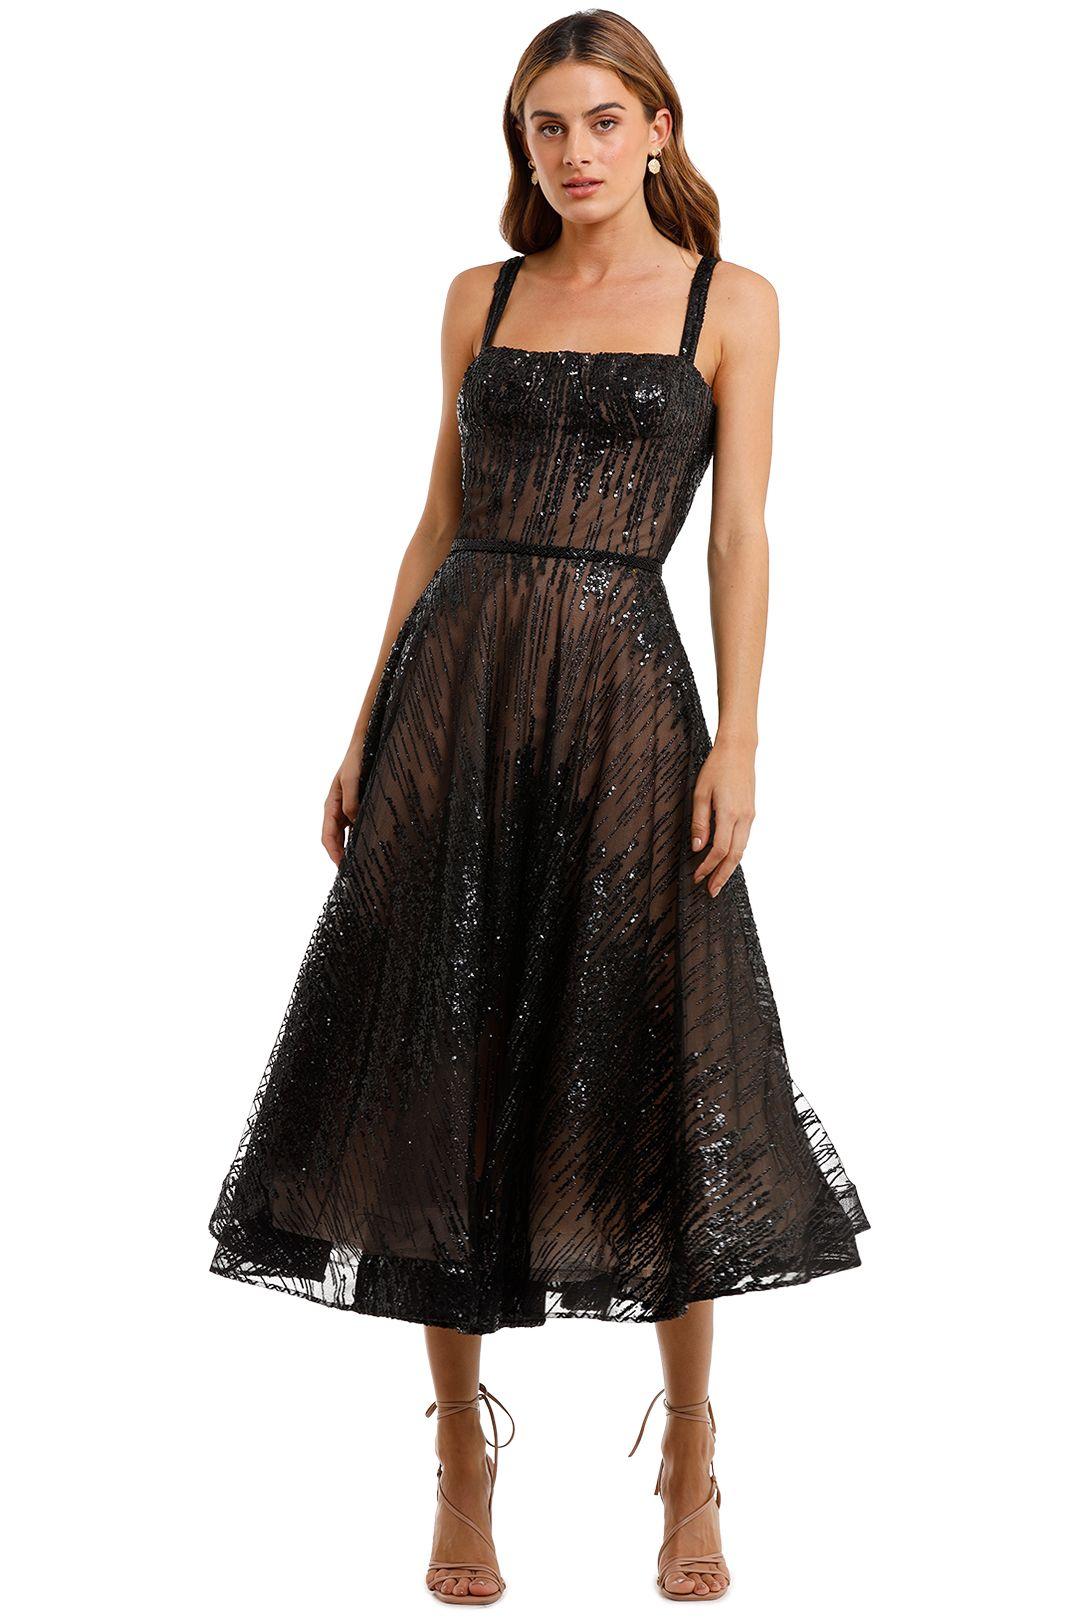 Bronx and Banco Mademoiselle Noir Dress Black